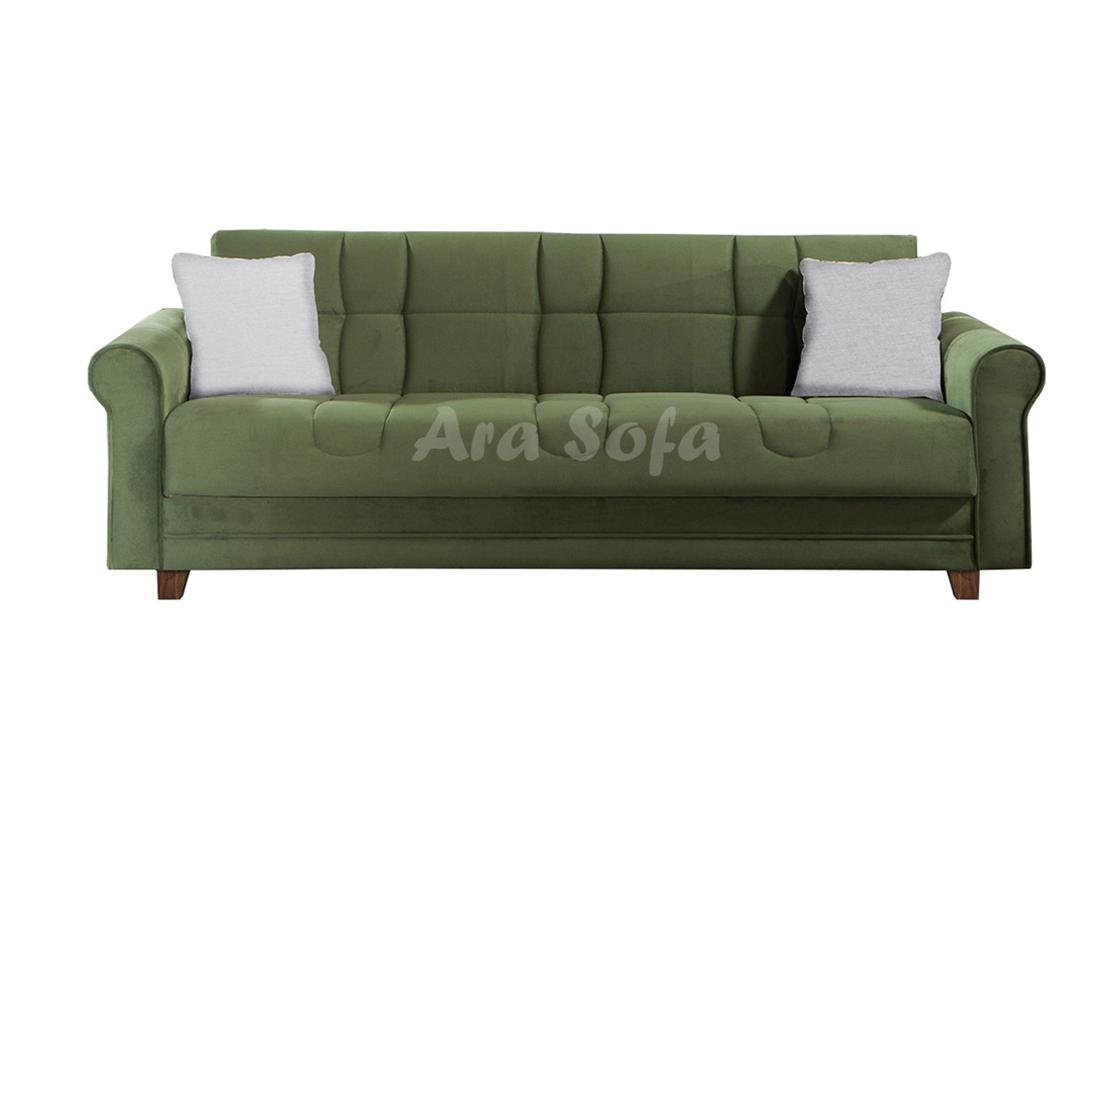 کاناپه راحتی تخت شو